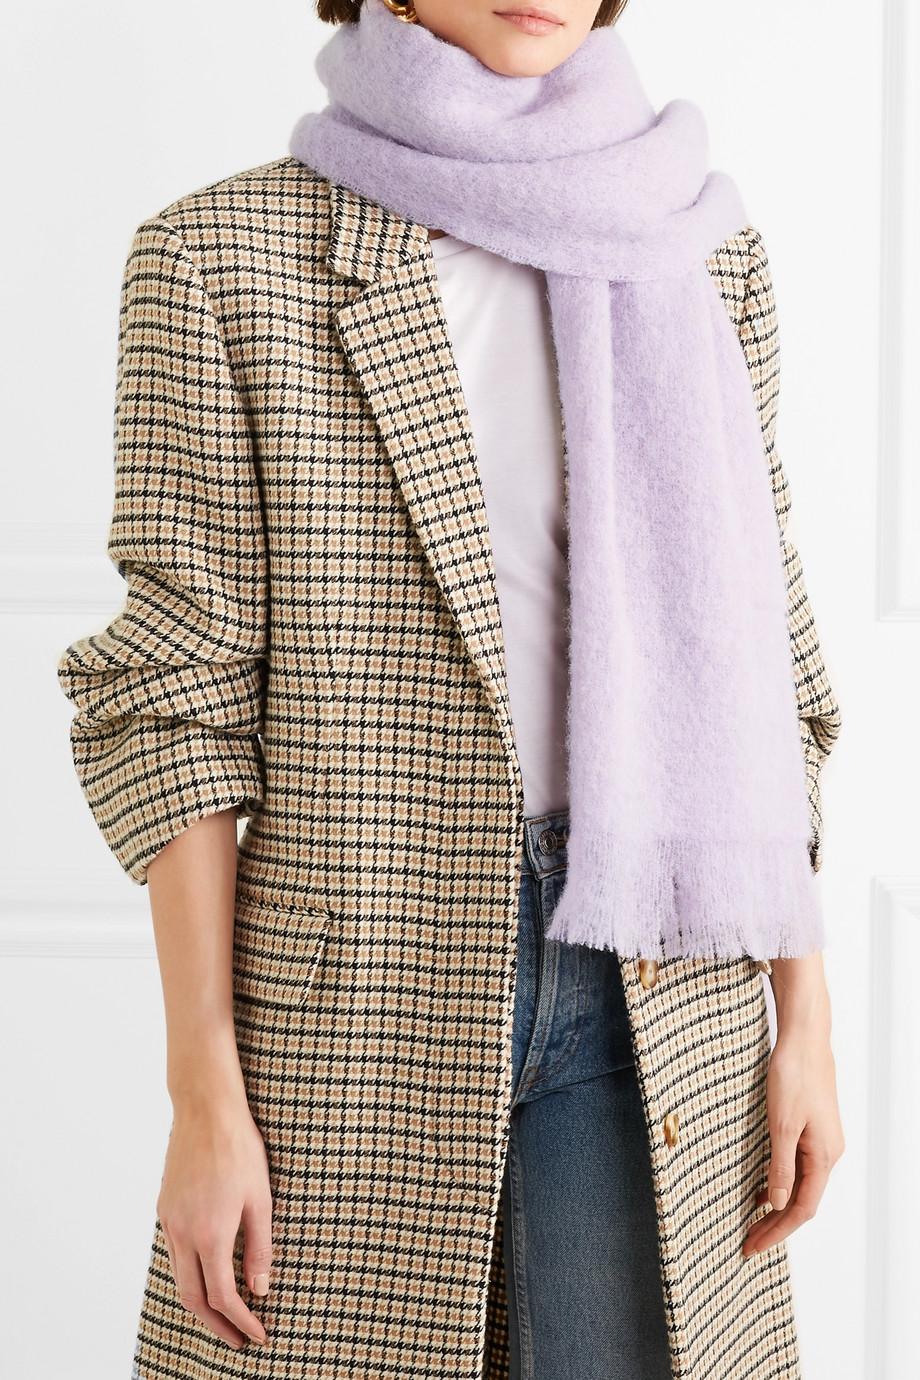 Holzweiler lavender scarf